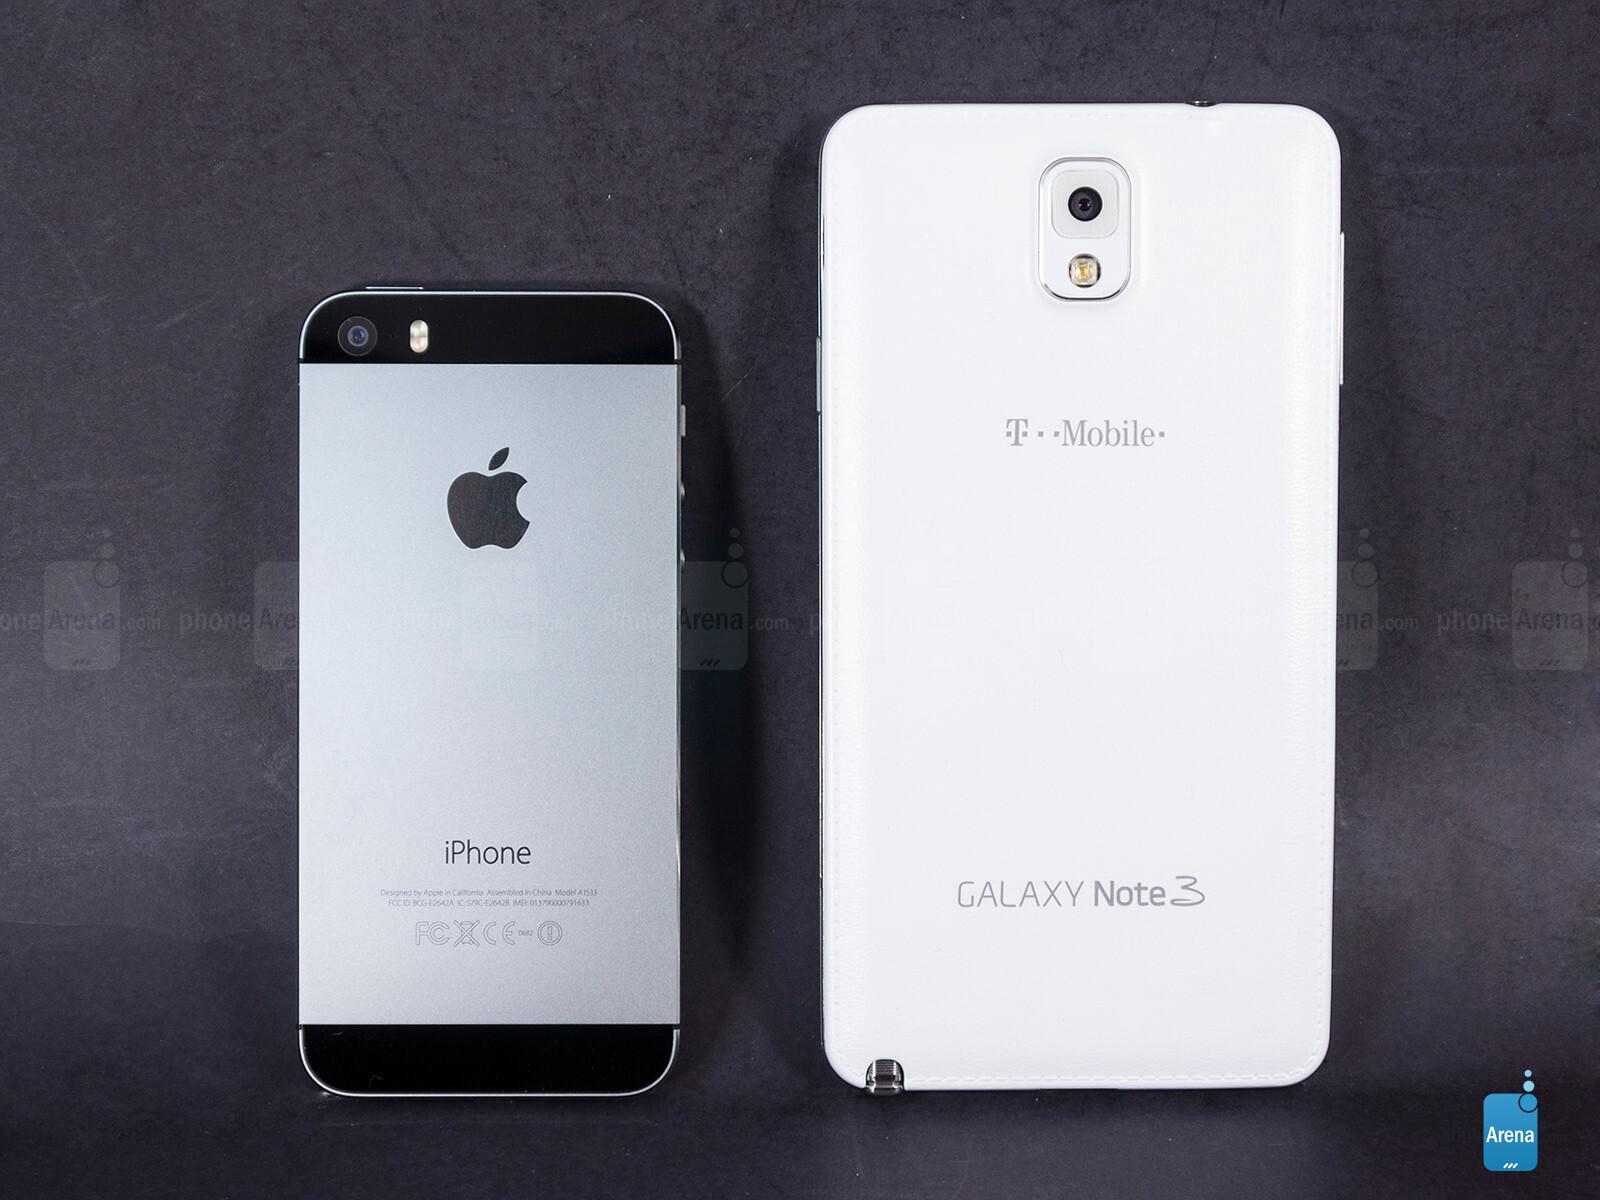 apple iphone 5s vs samsung galaxy note 3 phonearena. Black Bedroom Furniture Sets. Home Design Ideas